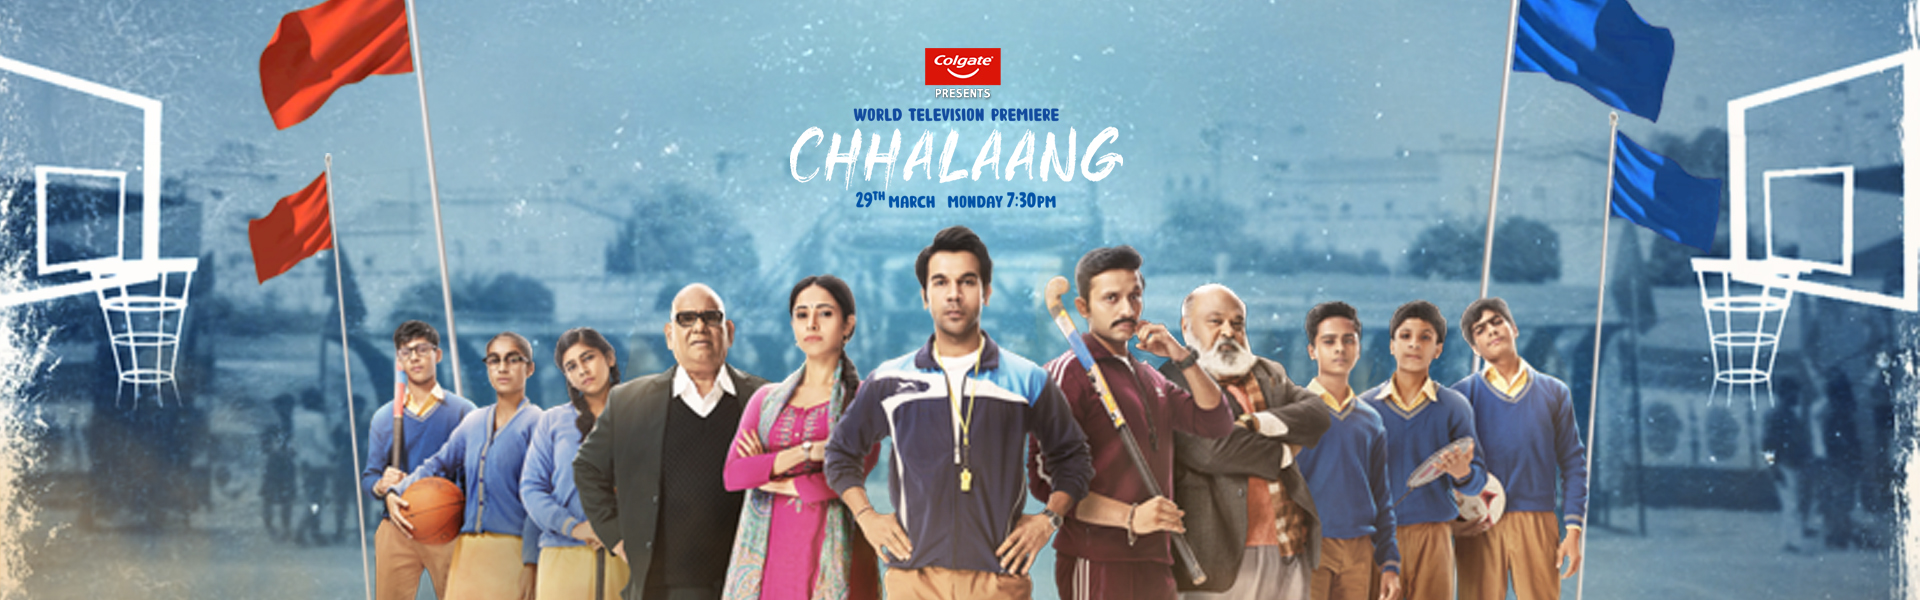 World Television Premiere Chhalaang